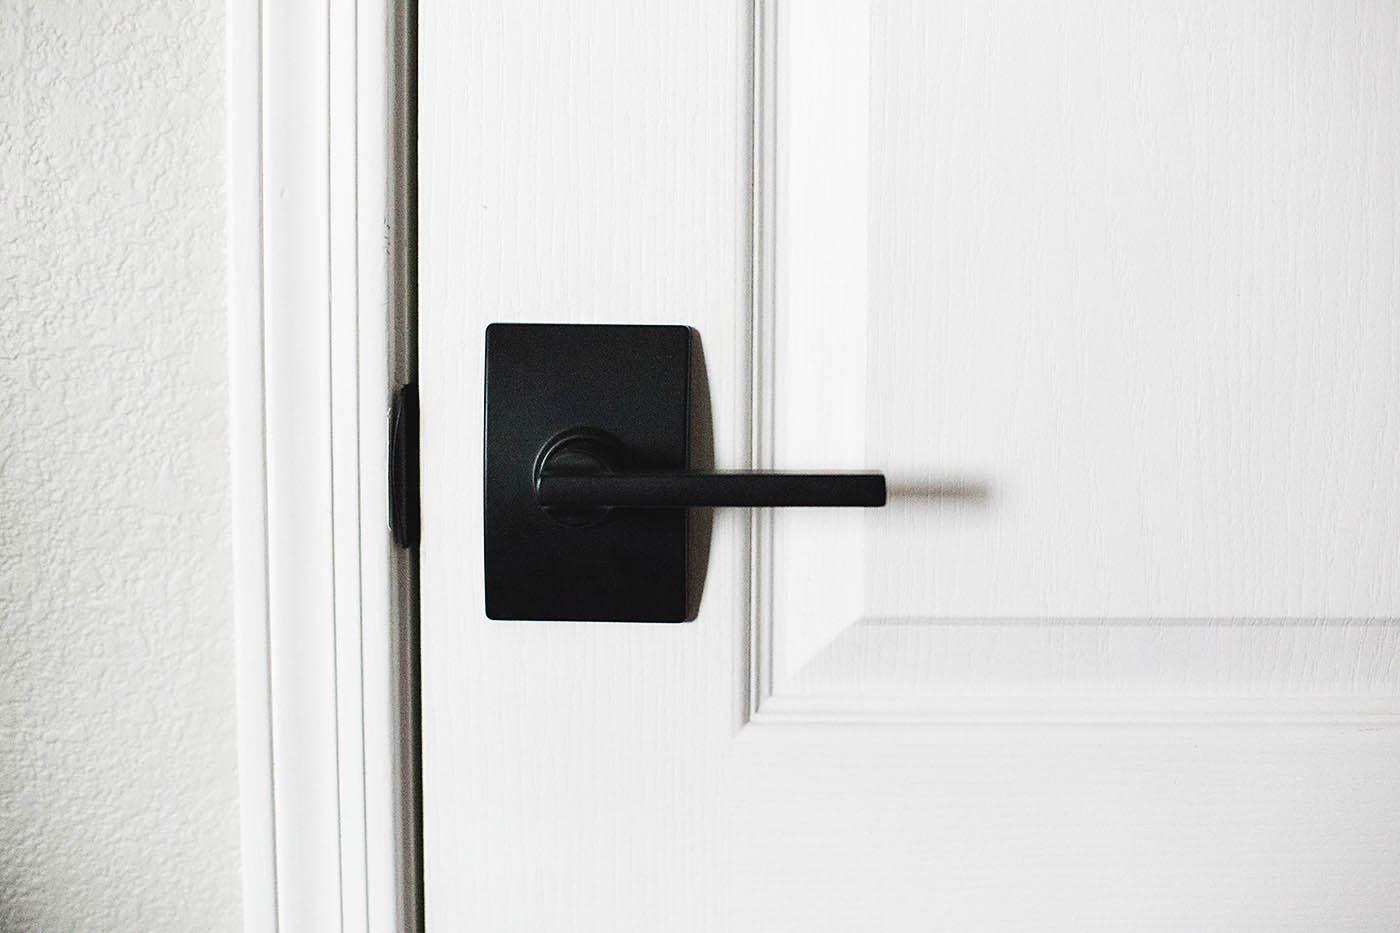 New black Schlage interior doorknobs